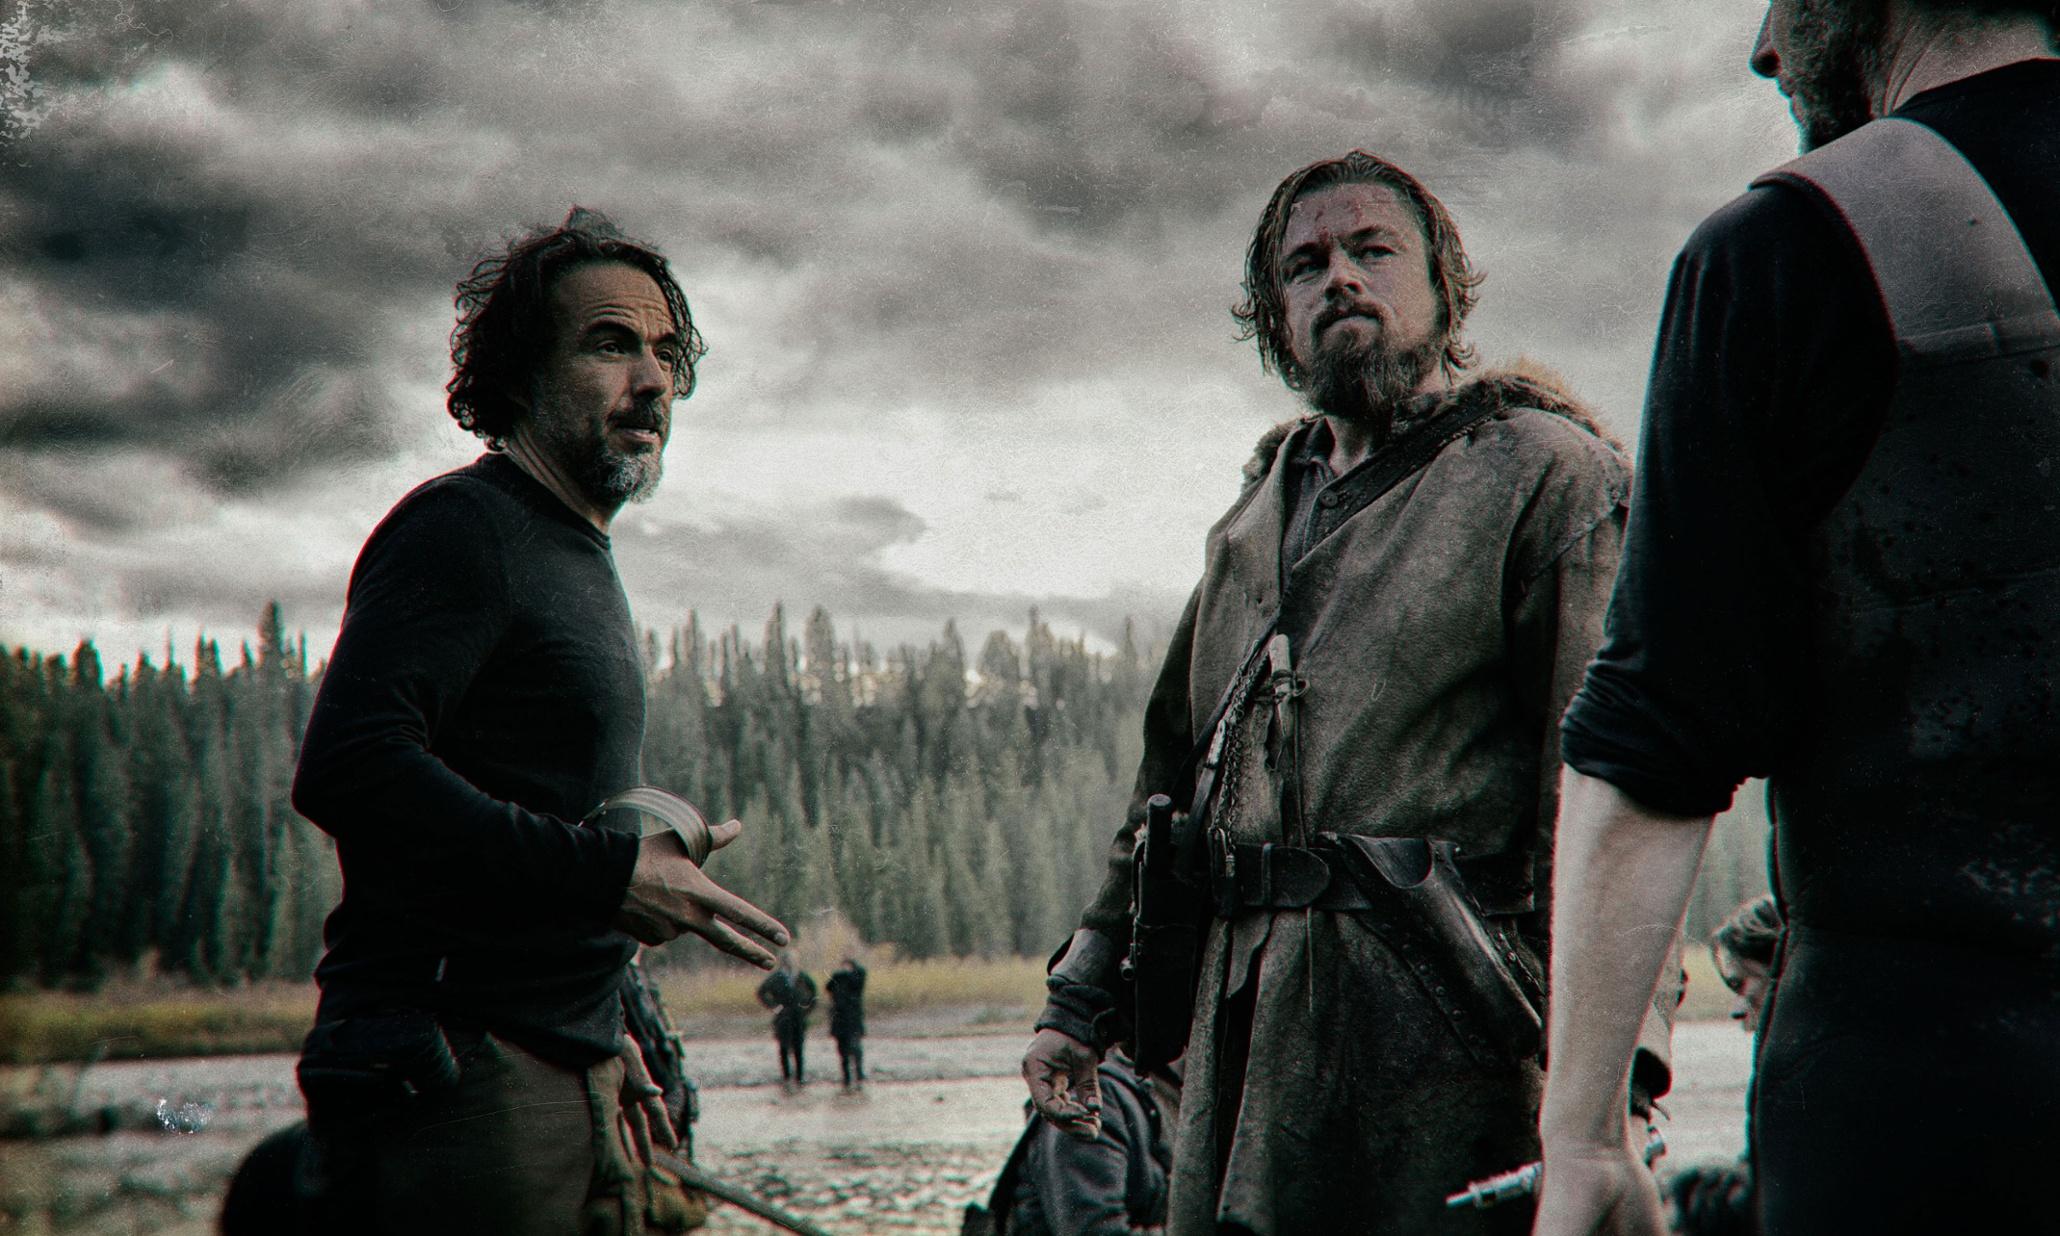 DiCaprio, filming The Revenant with Alejandro González Iñárritu in Calgary, Canada. Photo: The Guardian.